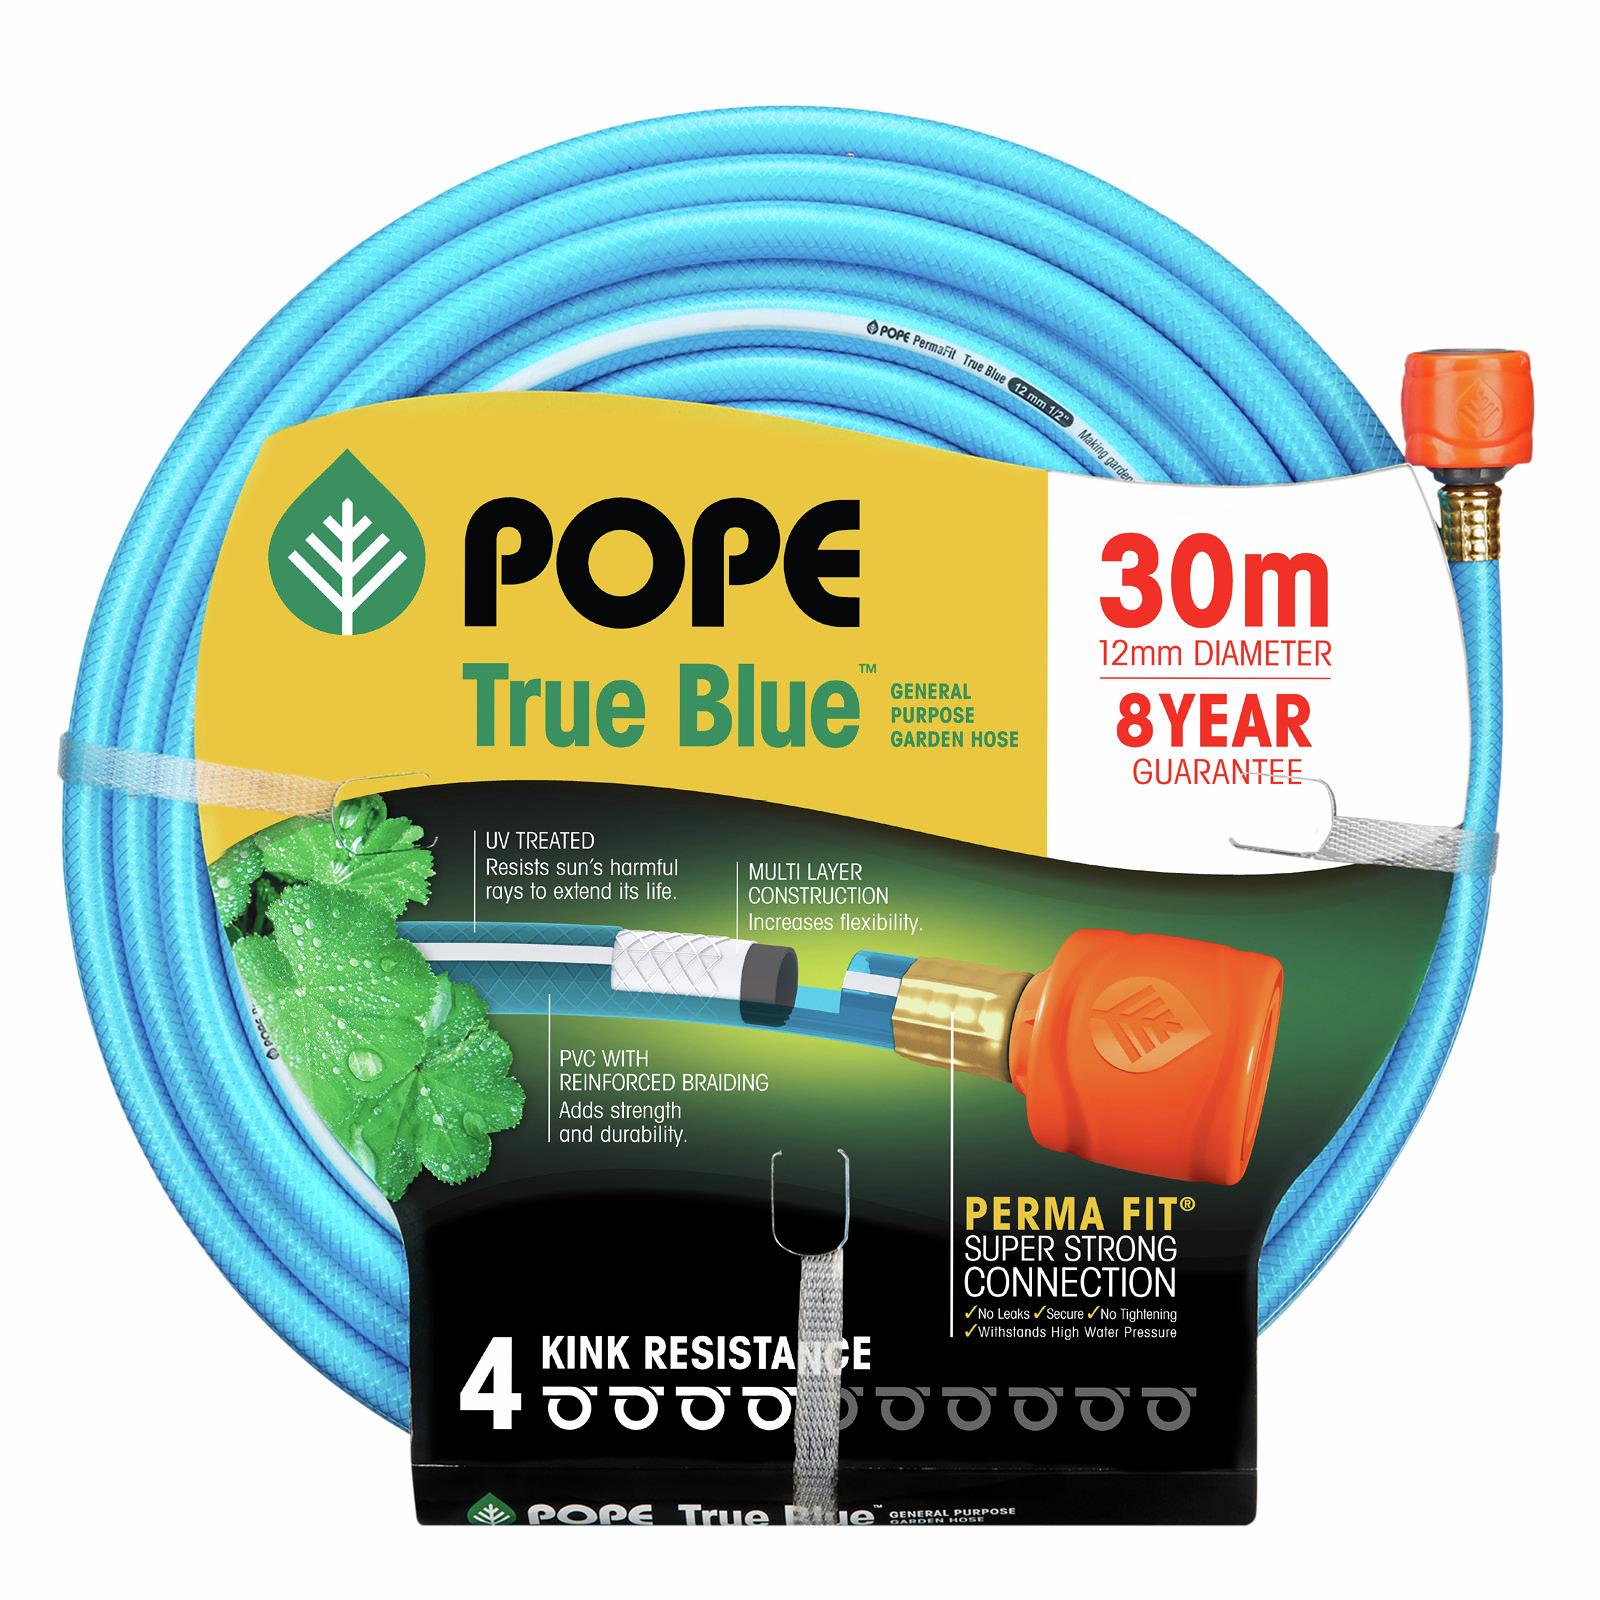 Pope 12mm x 30m True Blue Garden Hose